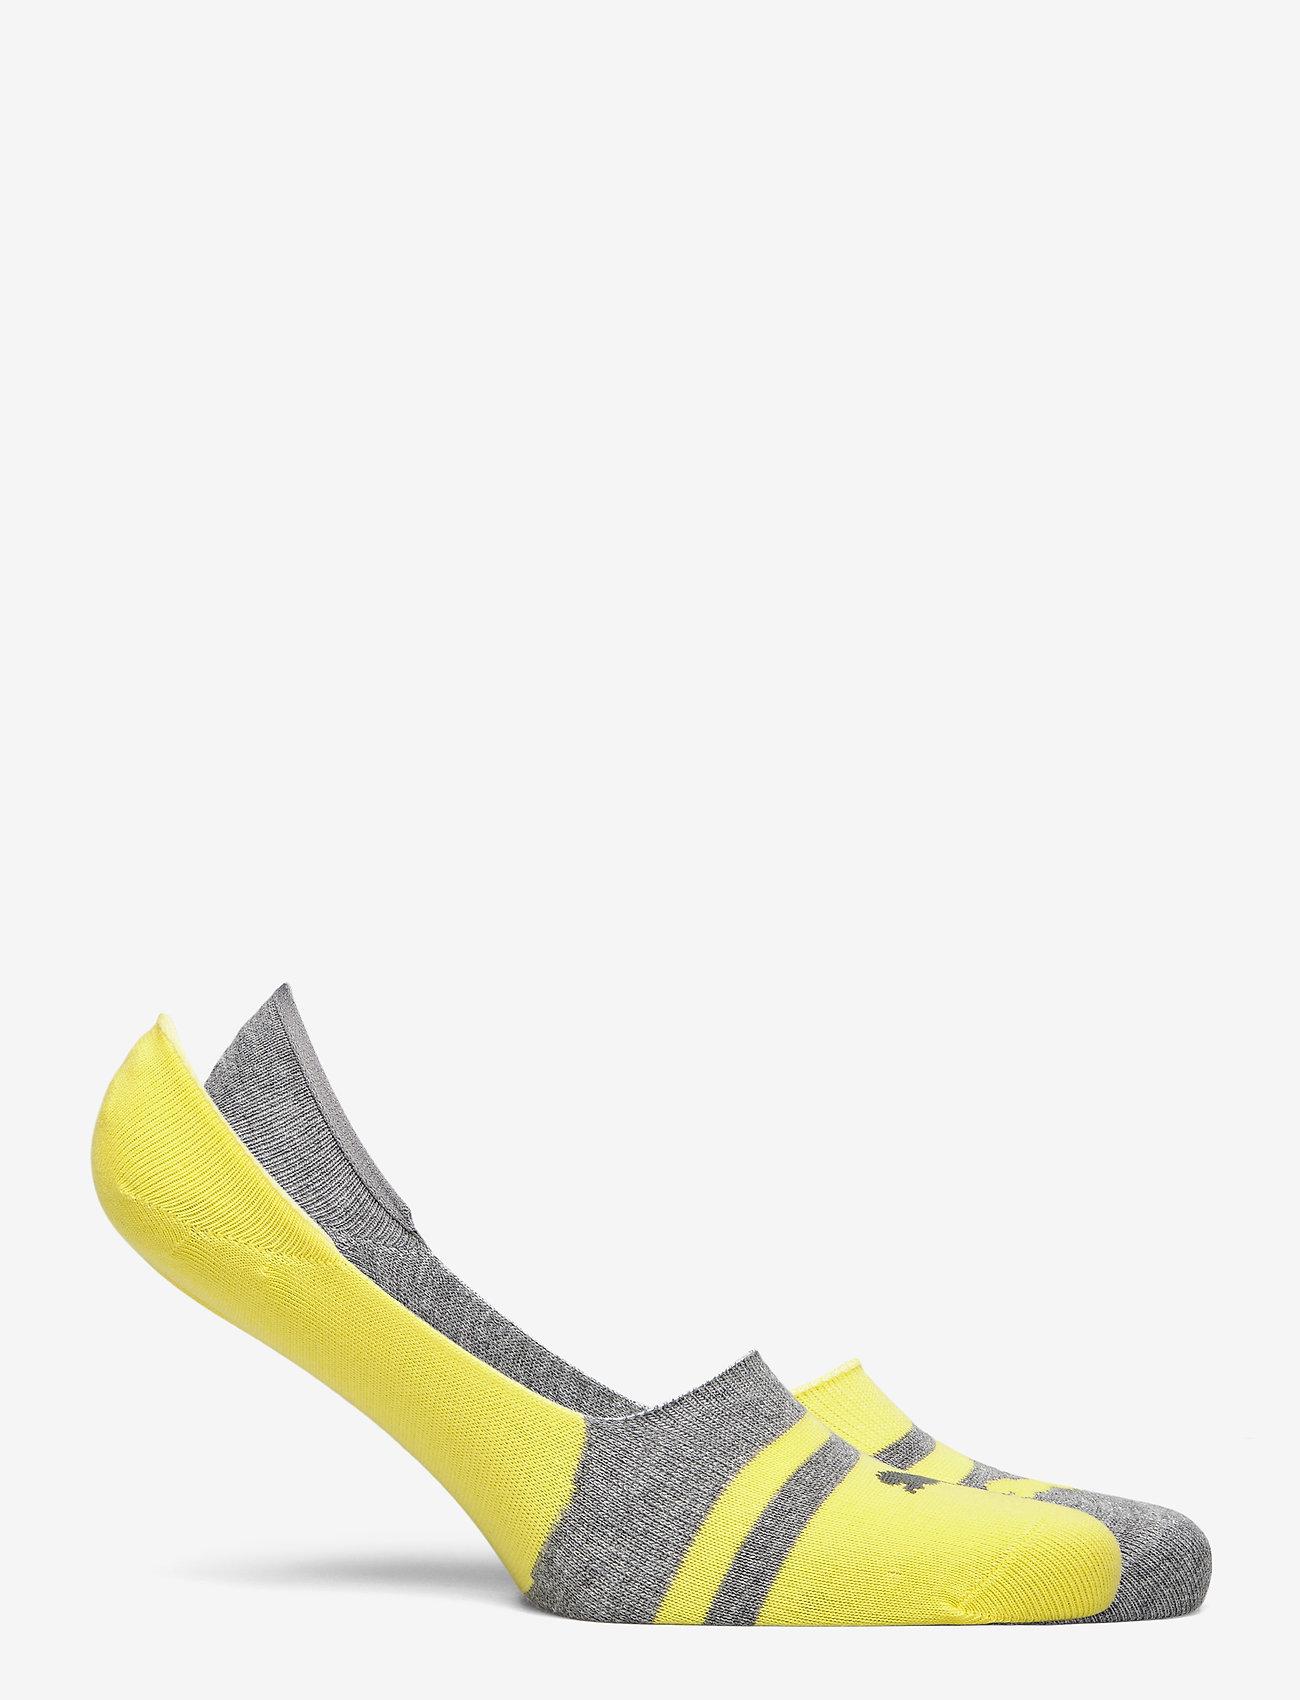 PUMA - PUMA HERITAGE FOOTIE 2P UNISEX - kousen - yellow - 1